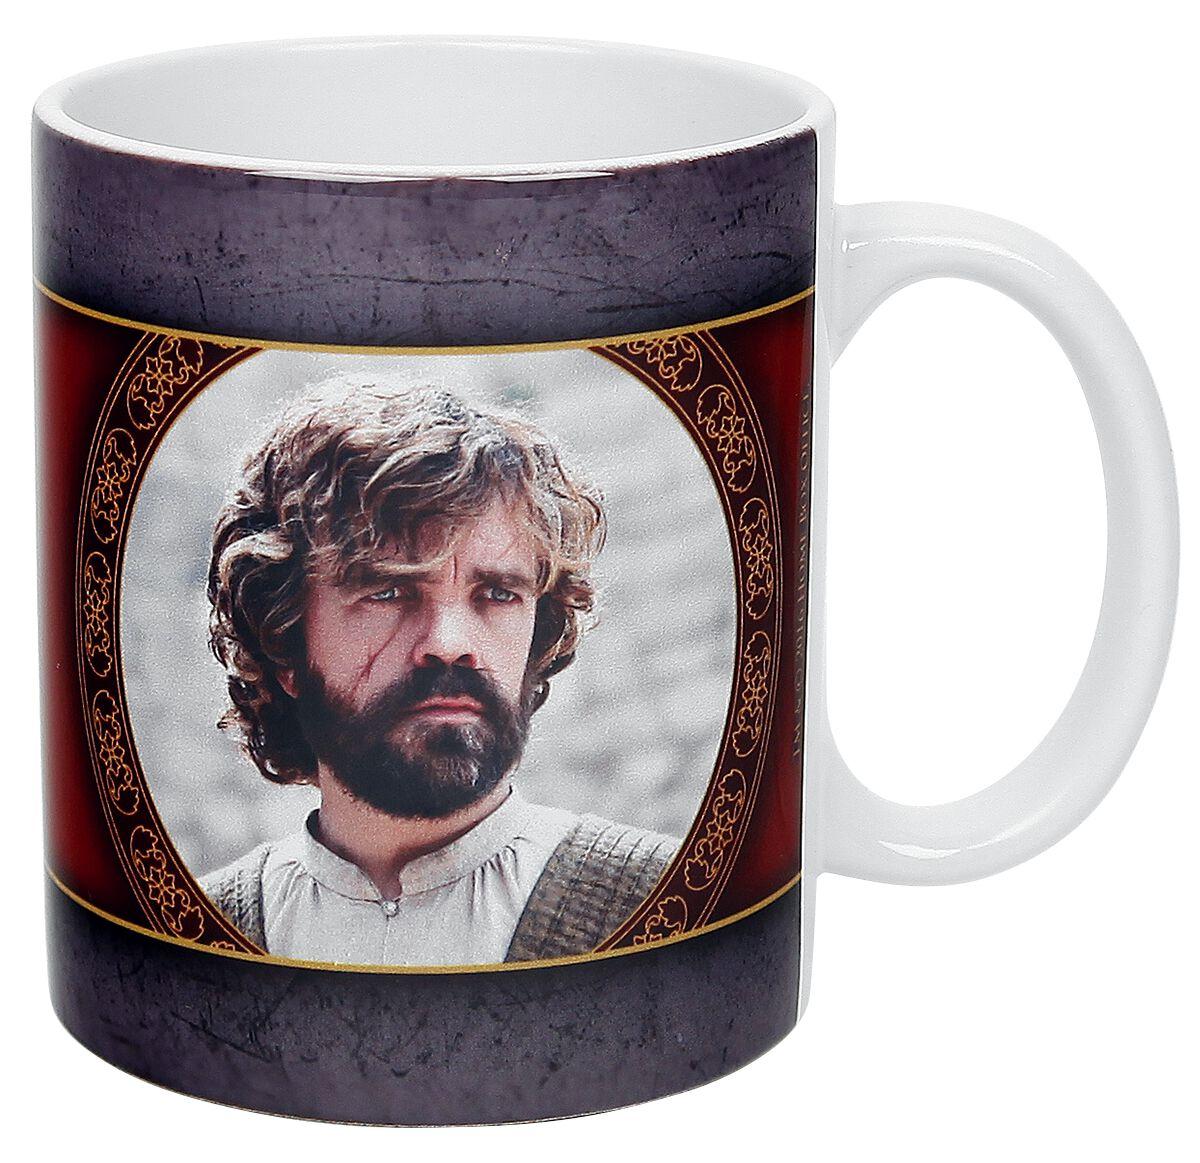 Image of   Game Of Thrones Drunk Tyrion Lannister Keramisk krus Standard